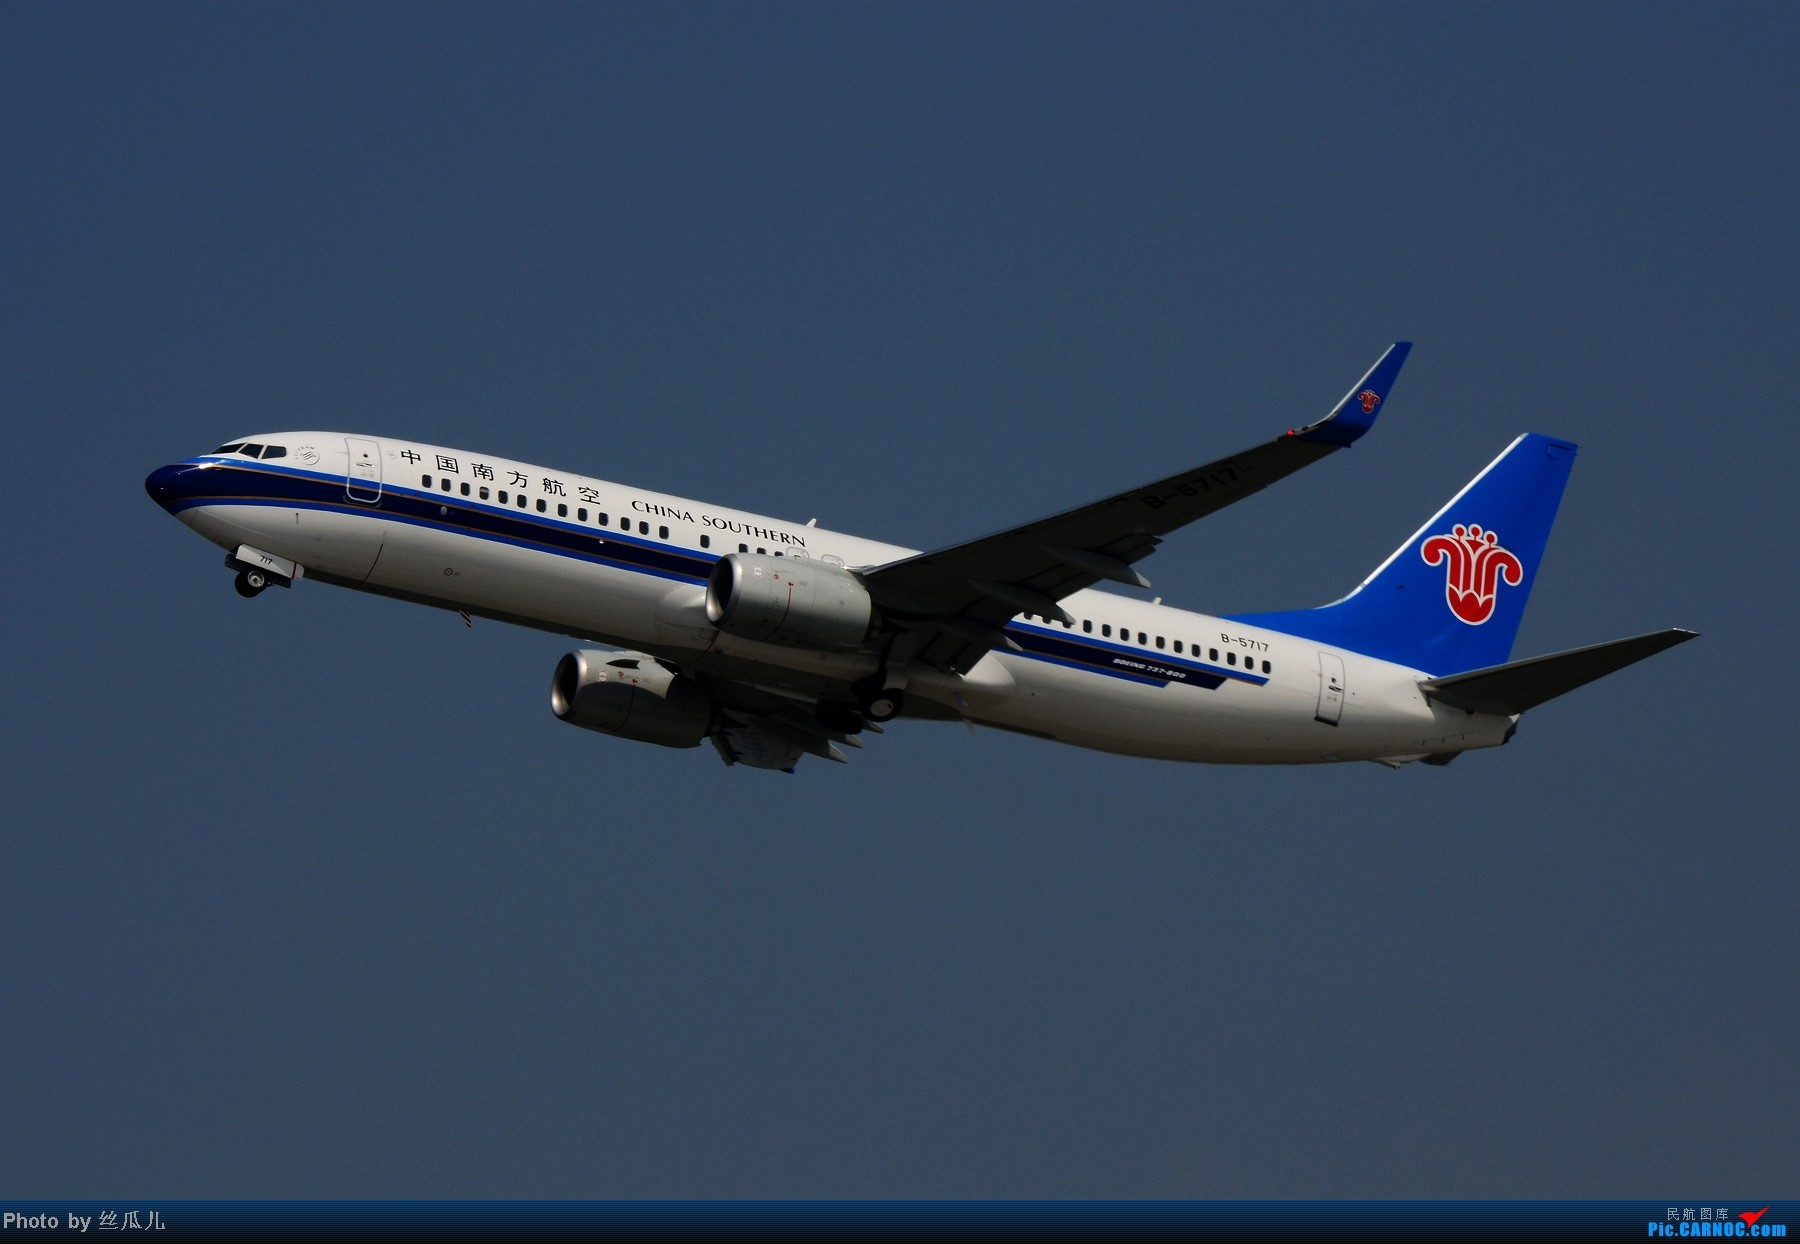 Re:[原创]2013年3月3日-萧山机场-晴 BOEING 737-81B(WL) B-5717 中国杭州萧山机场